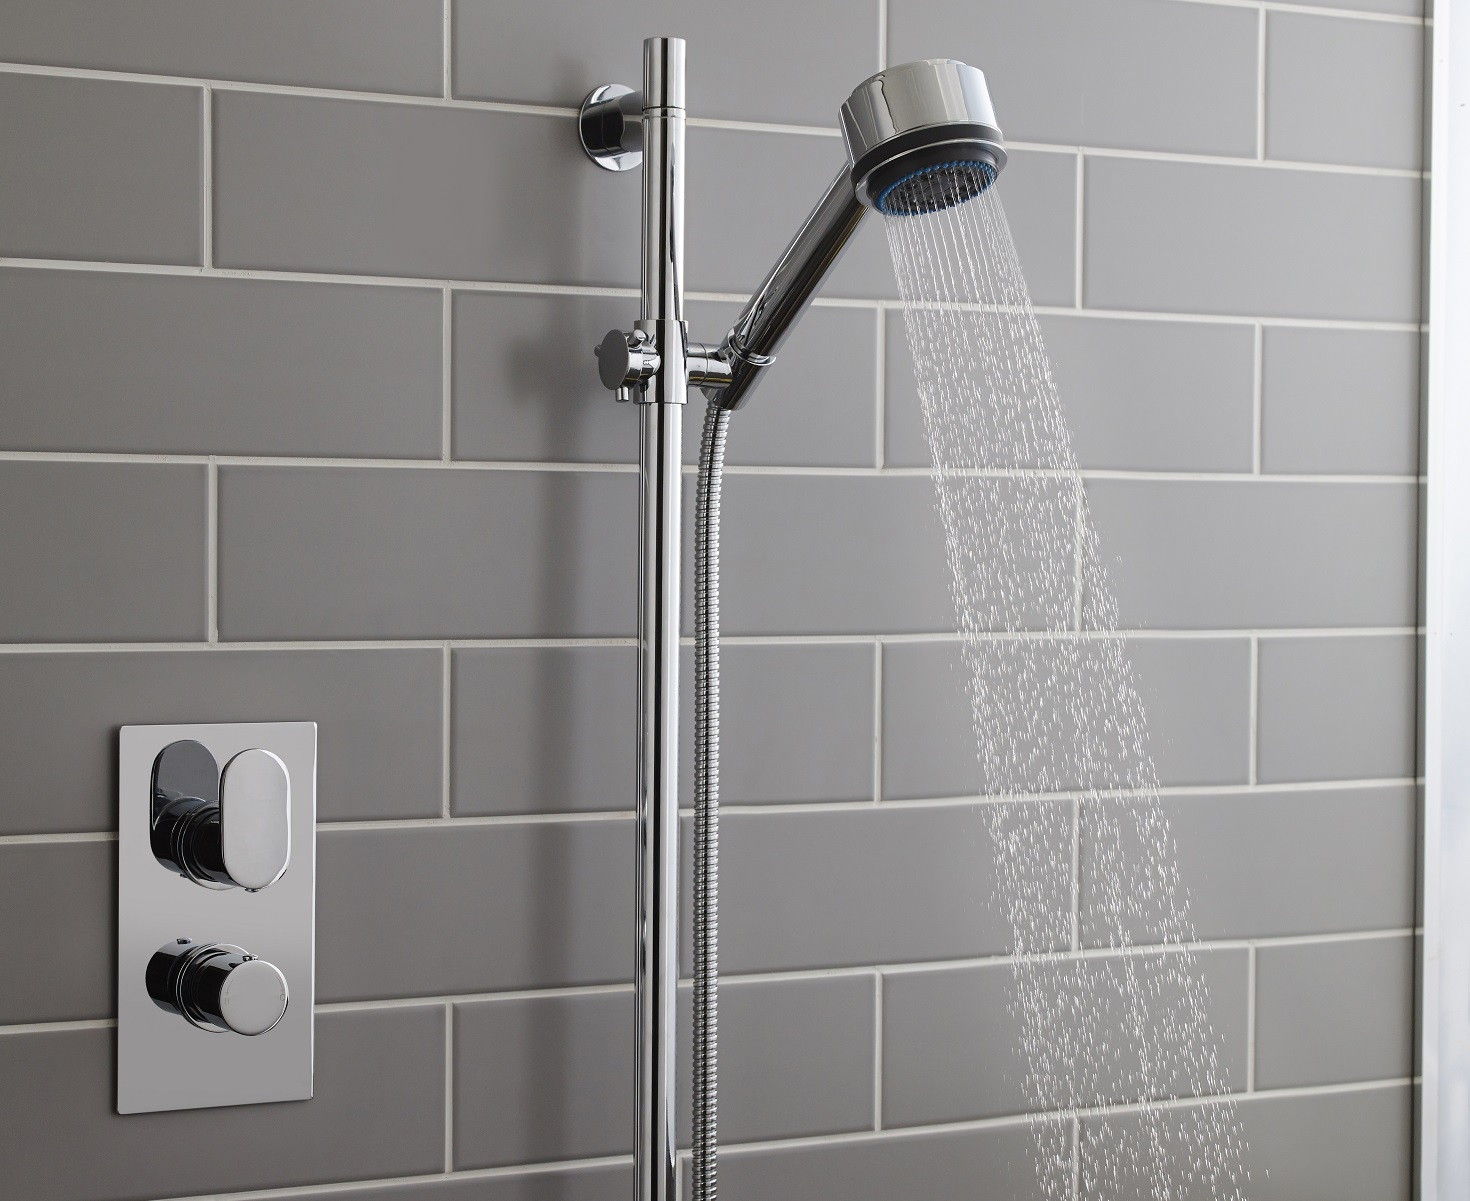 shower head images. Descaling A Handheld Shower Head Images